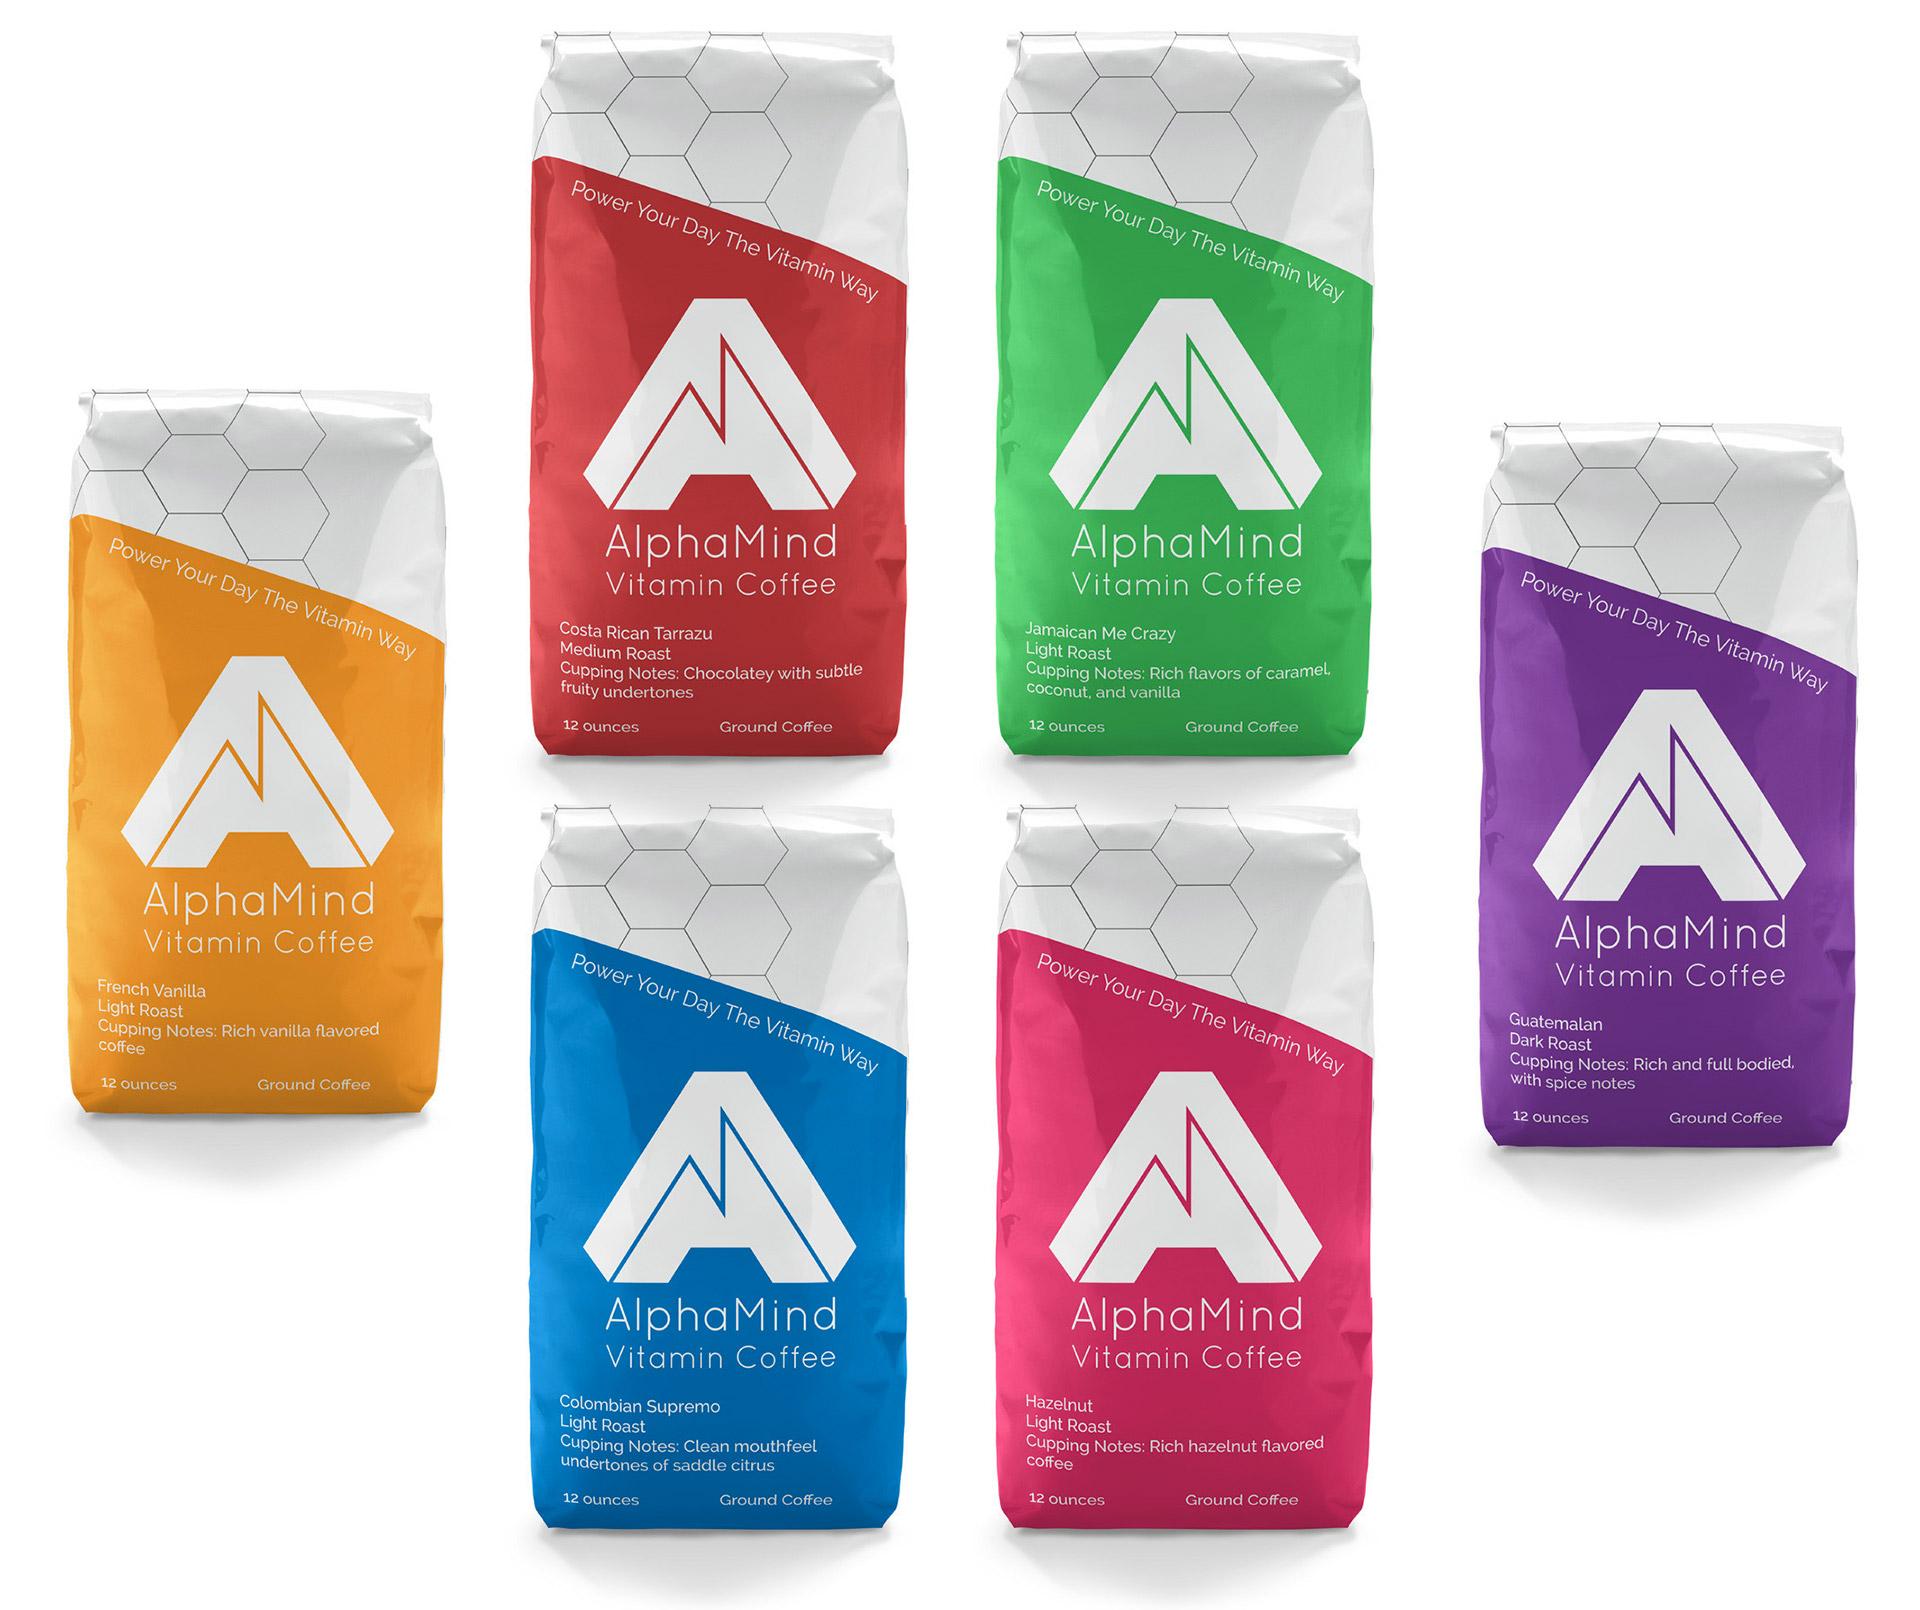 alphamind_vitamin_coffee_1.jpg